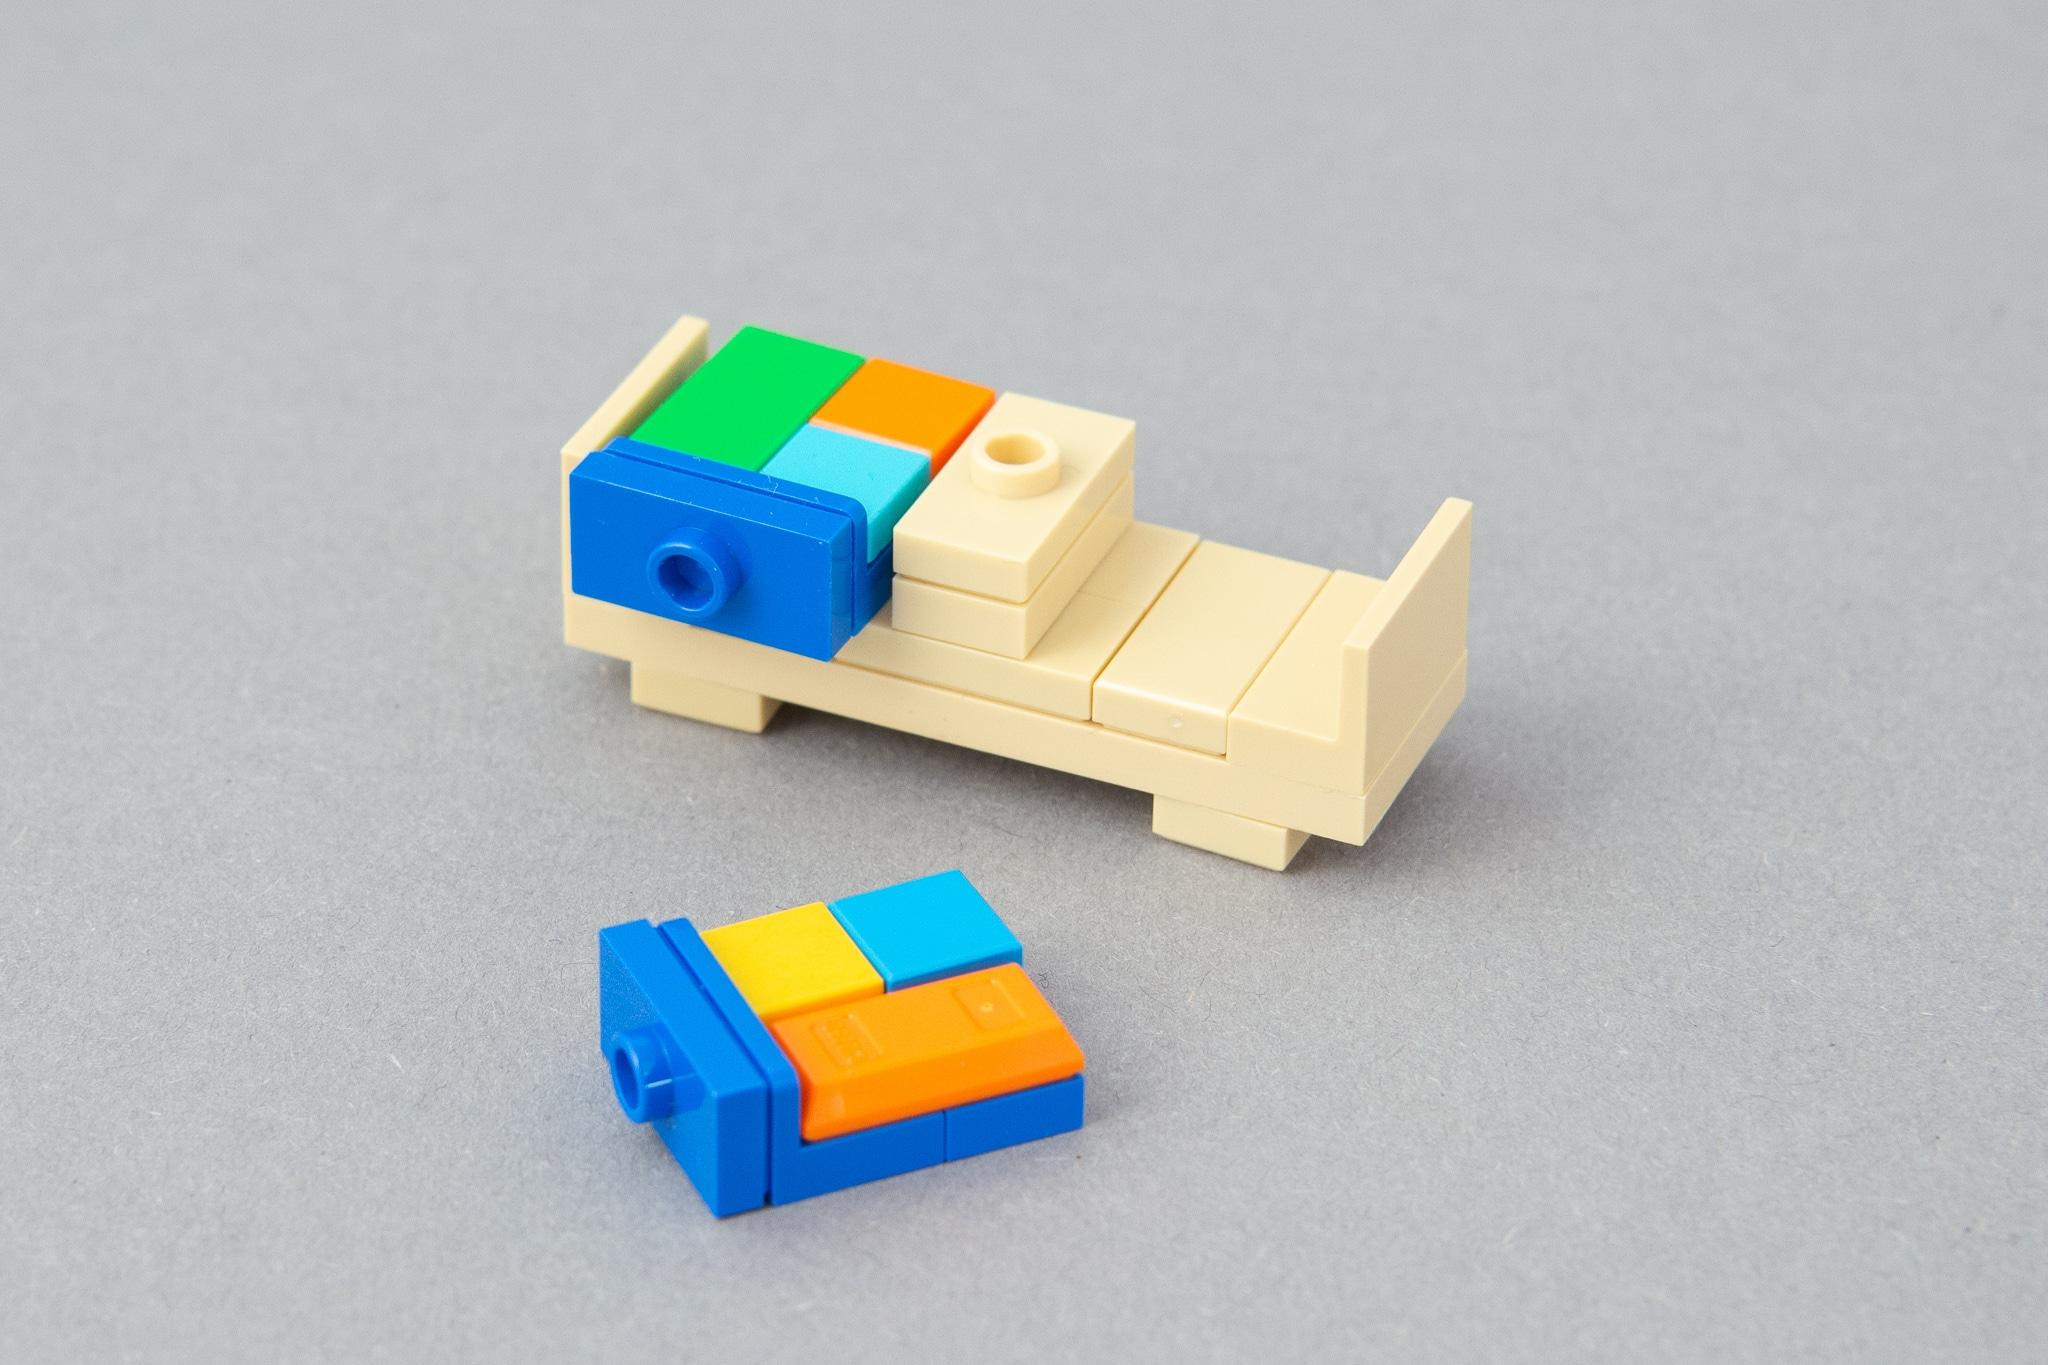 LEGO MOC Schrank Tutorial